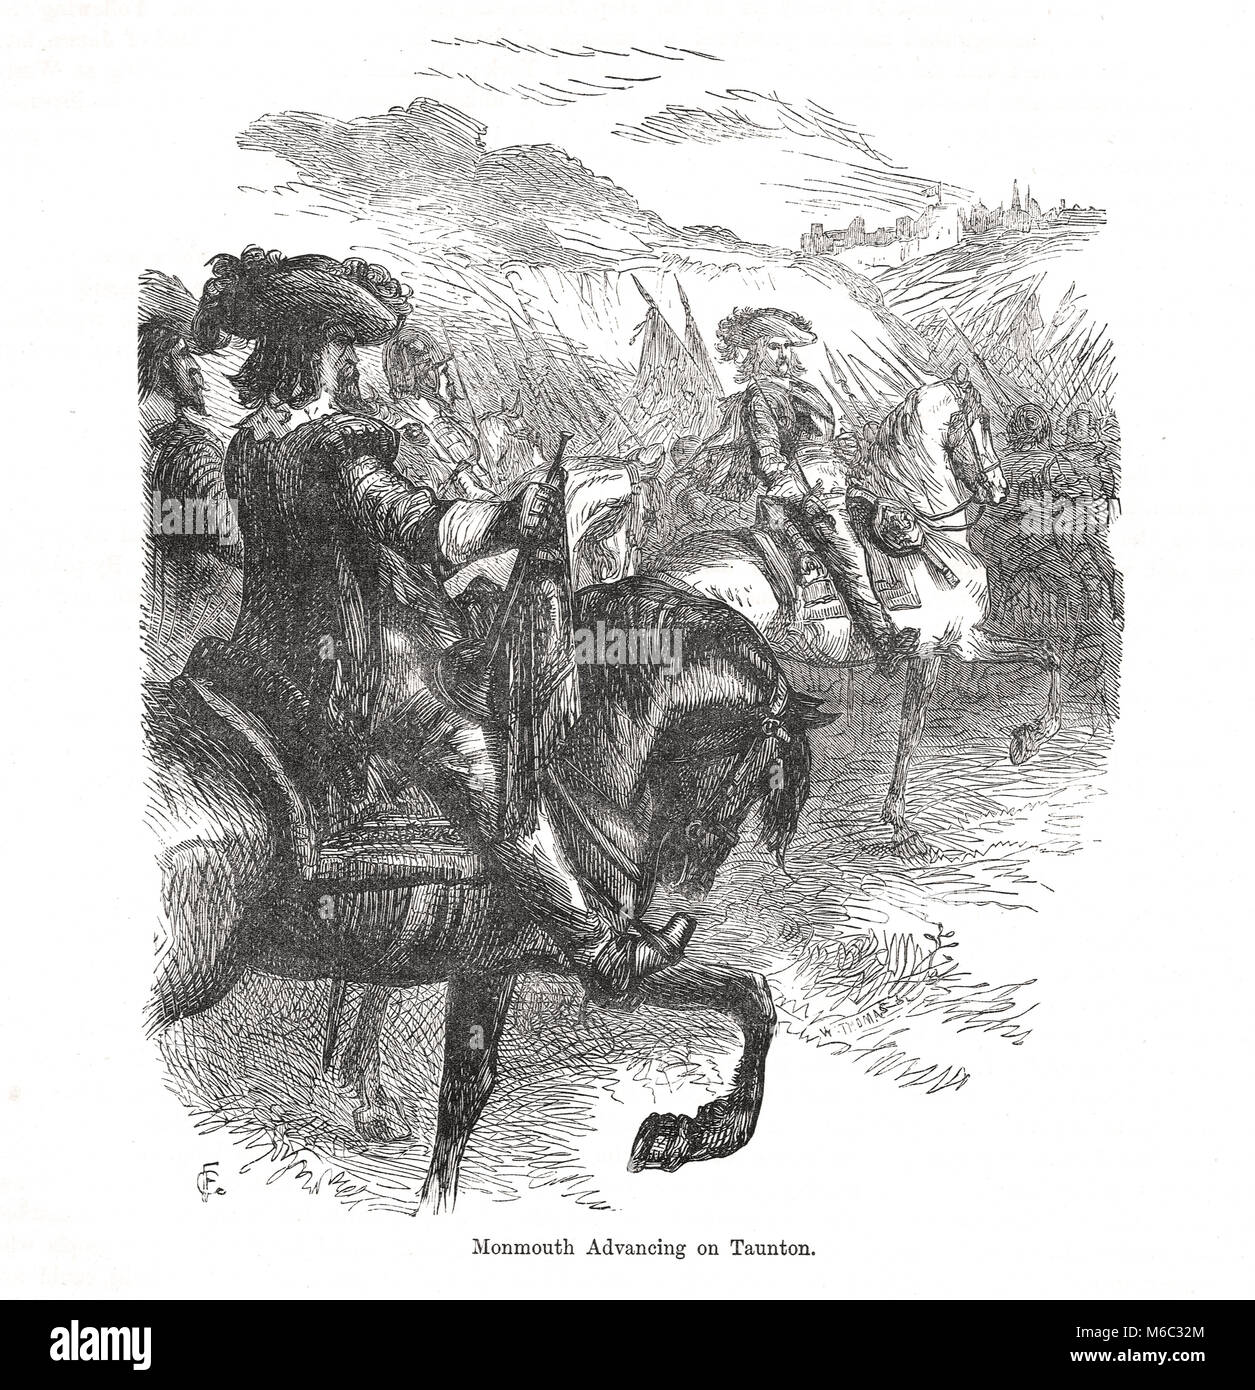 James Scott, 1st Duke of Monmouth advancing on Taunton.  The  Monmouth Rebellion of 1685 - Stock Image